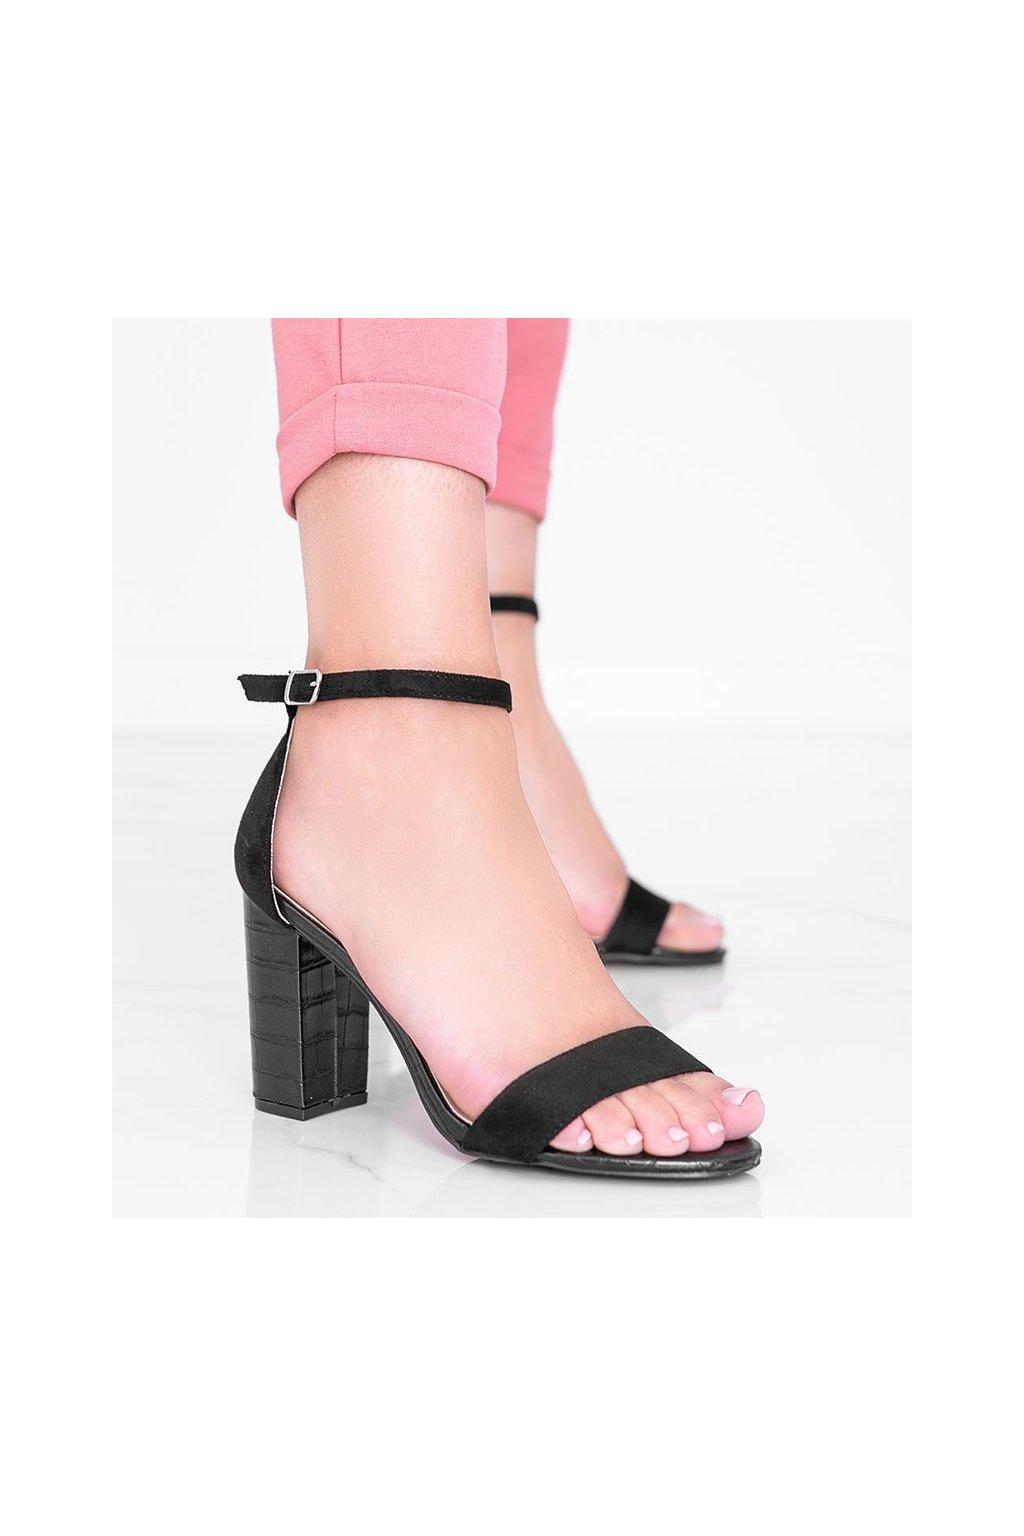 Dámske topánky sandále čierne kód 223-SA-2 - GM